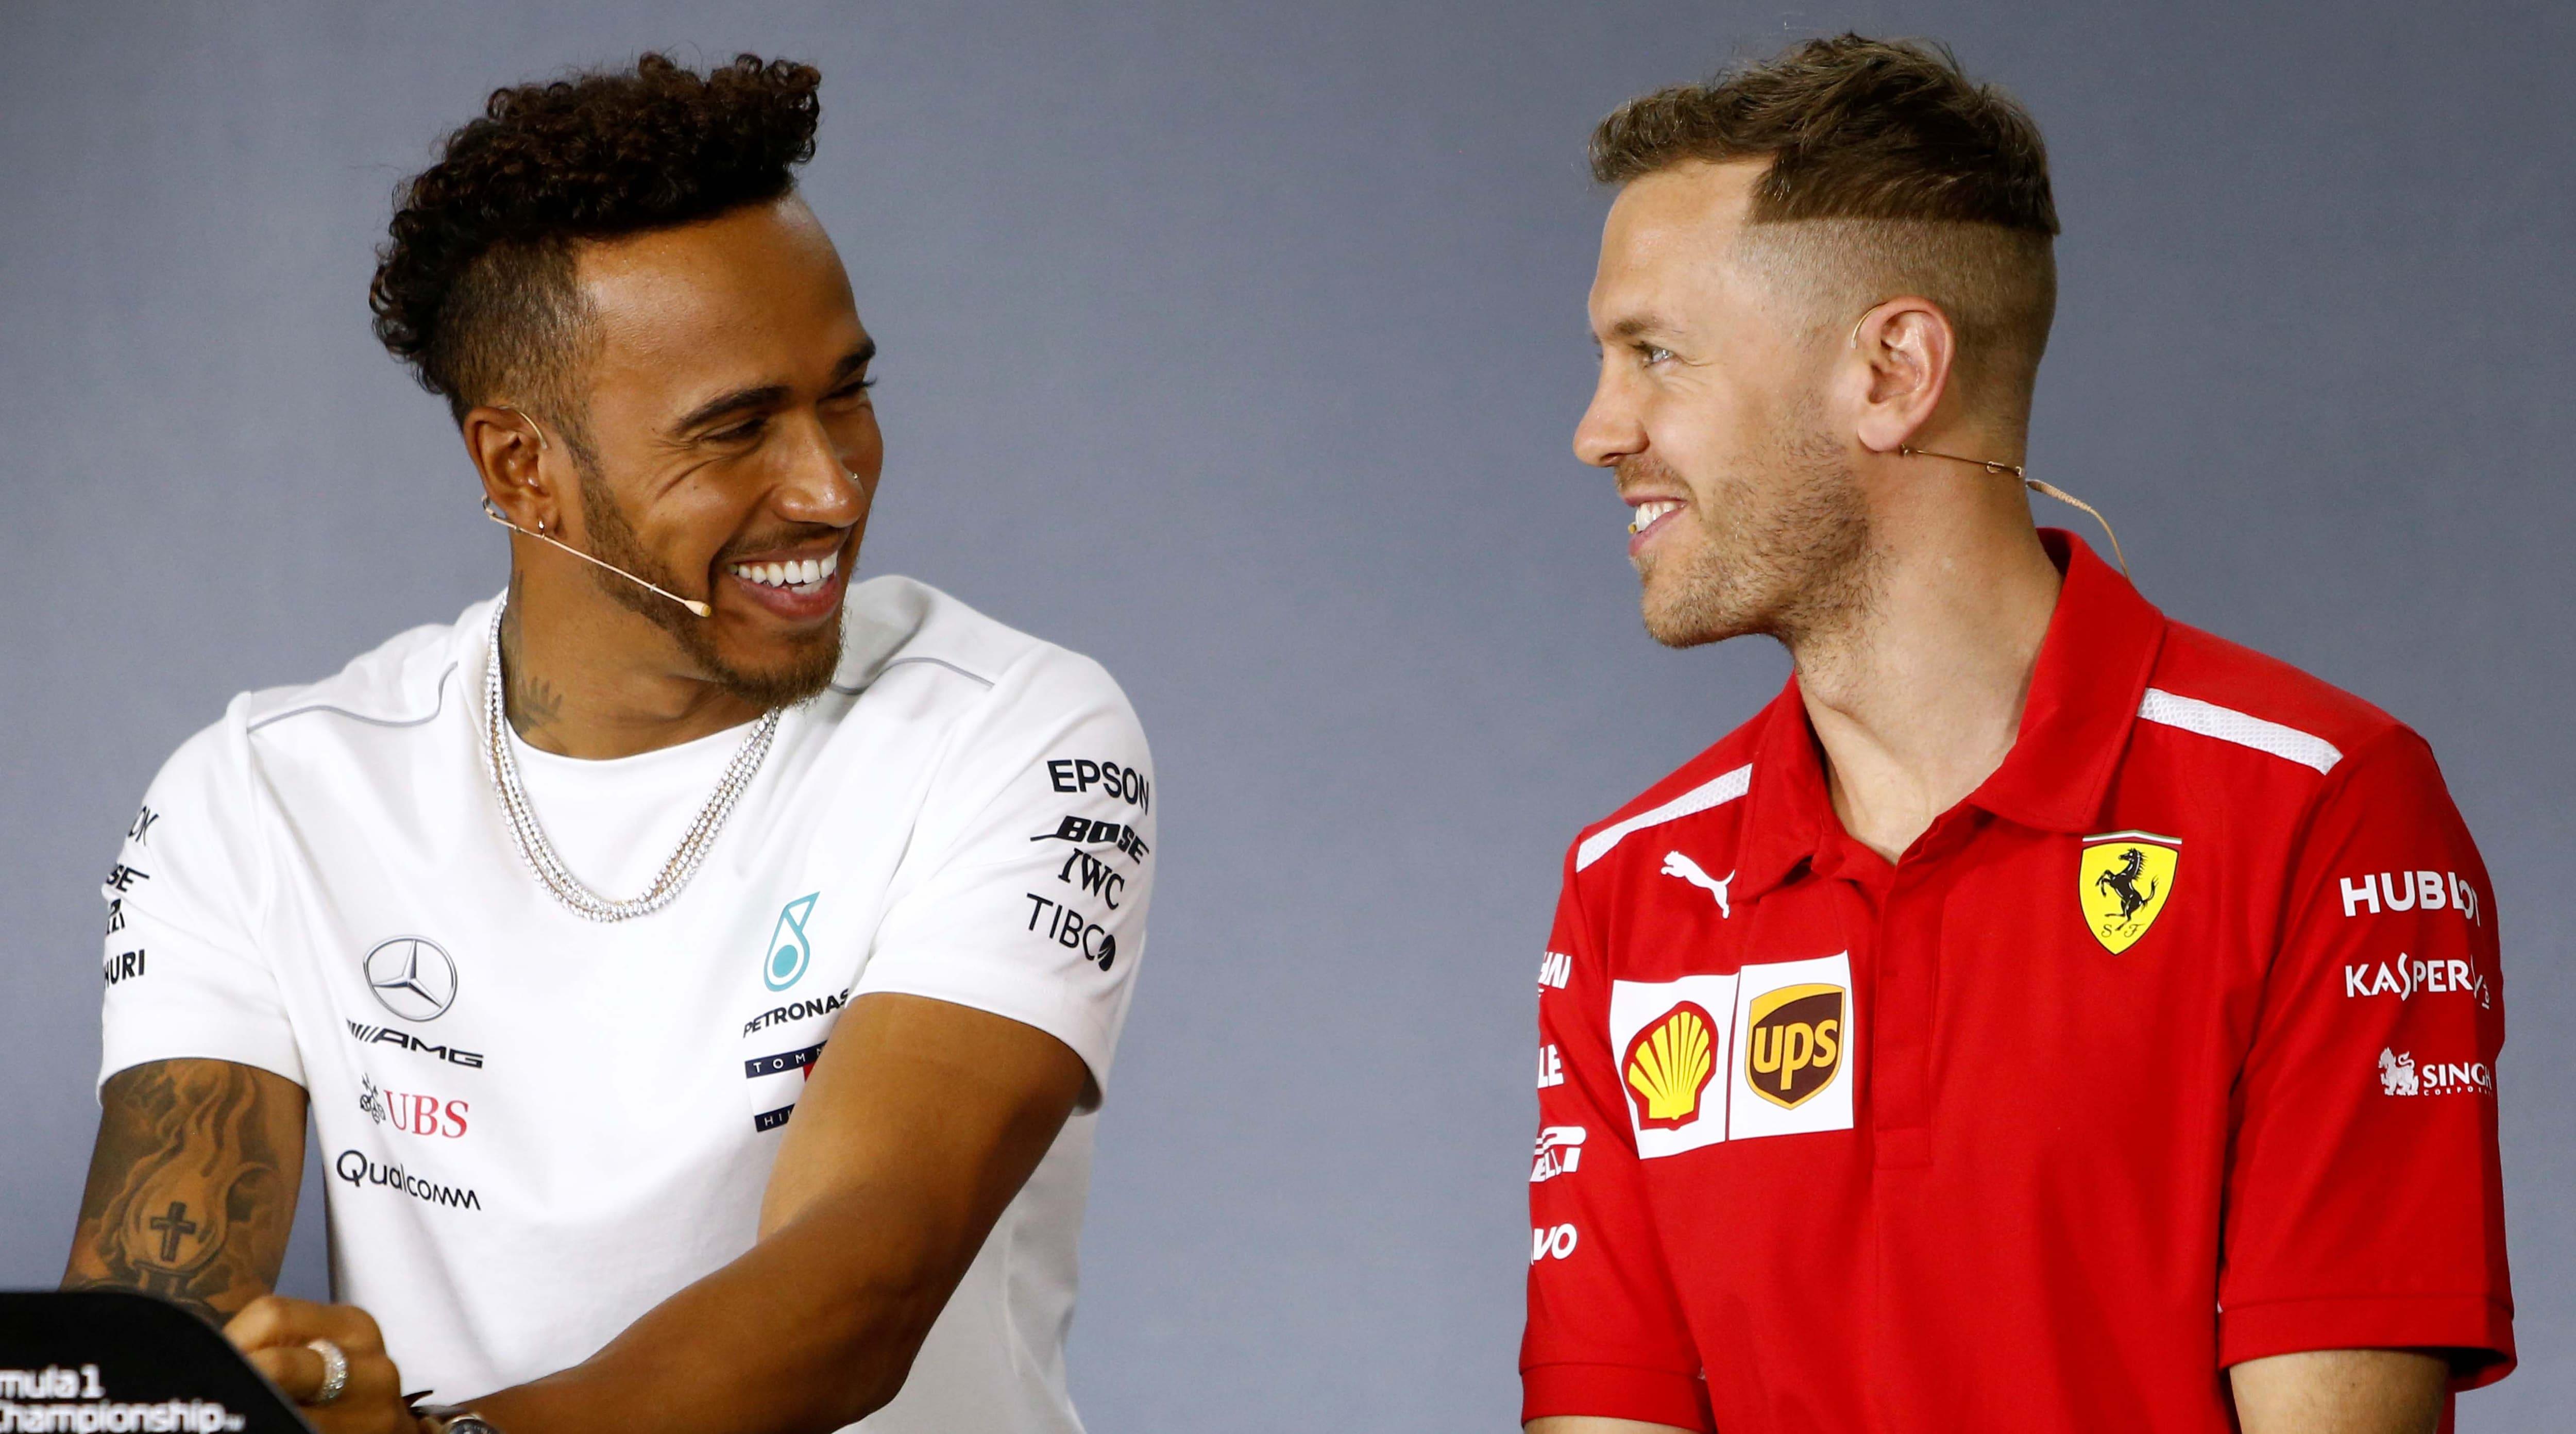 Lewis Hamilton, Sebastian Vettel savour competing against the 'best'